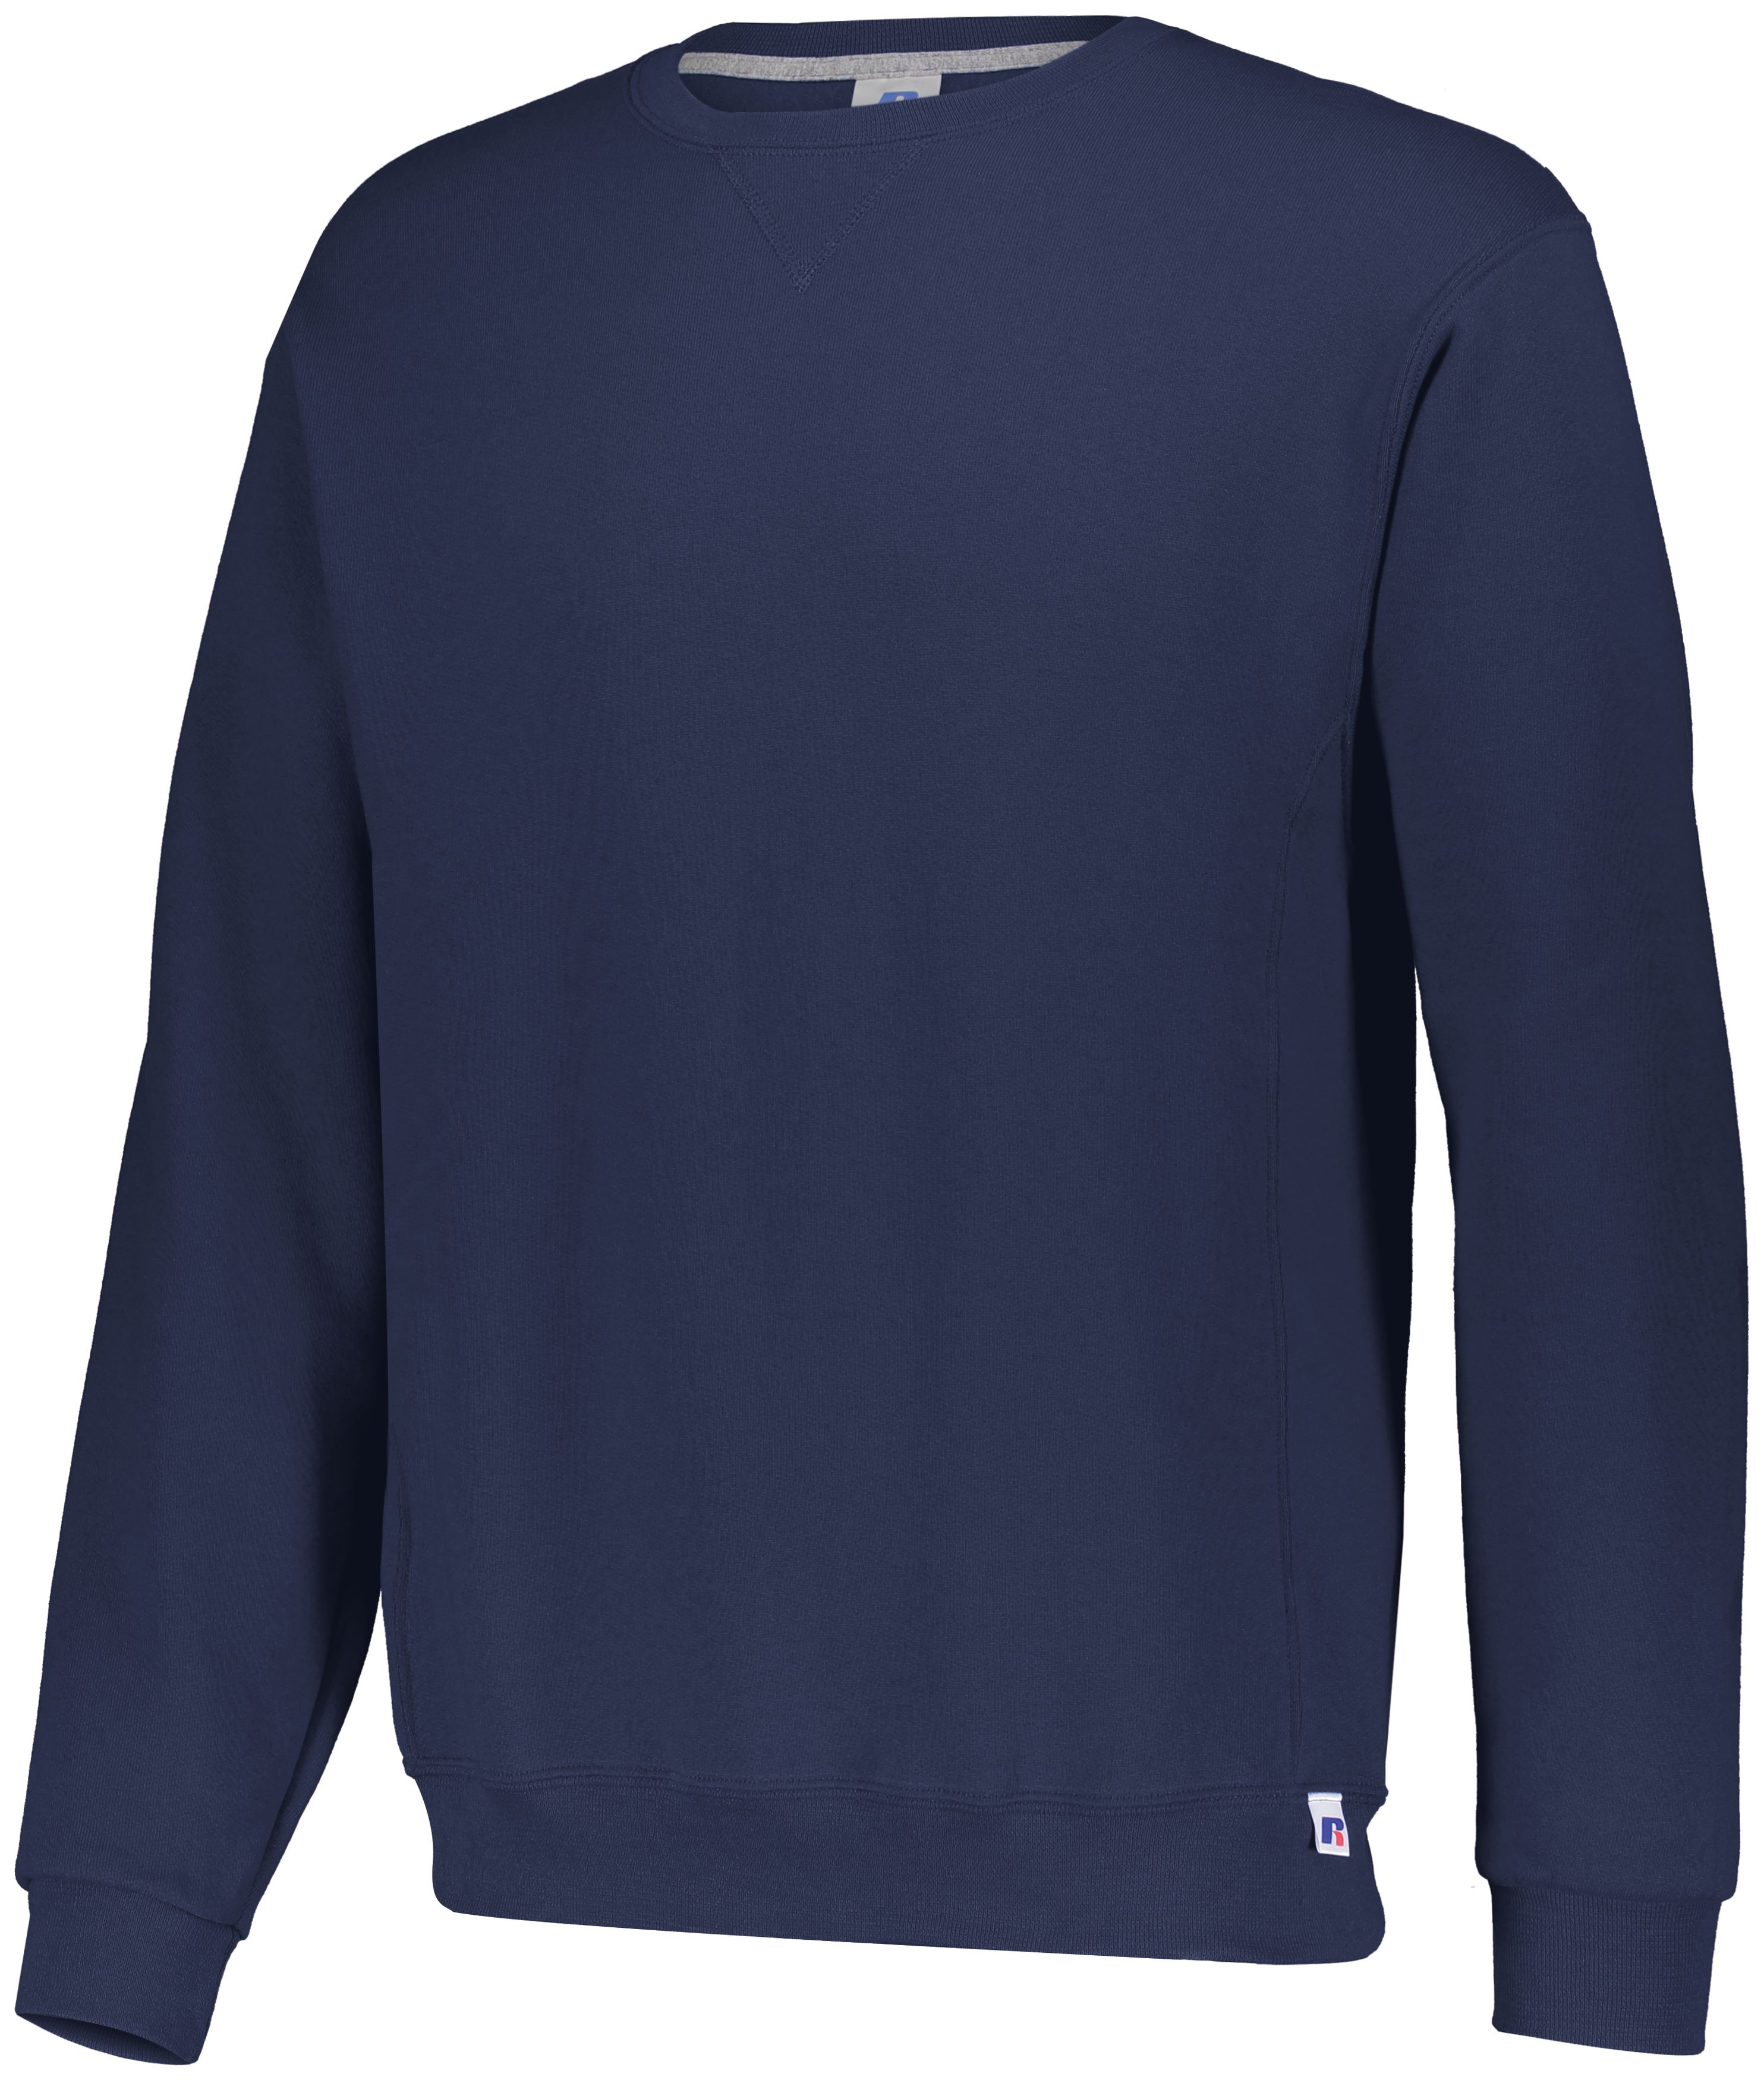 998HBB Russell Athletic Youth Dri Power Crewneck Sweatshirt